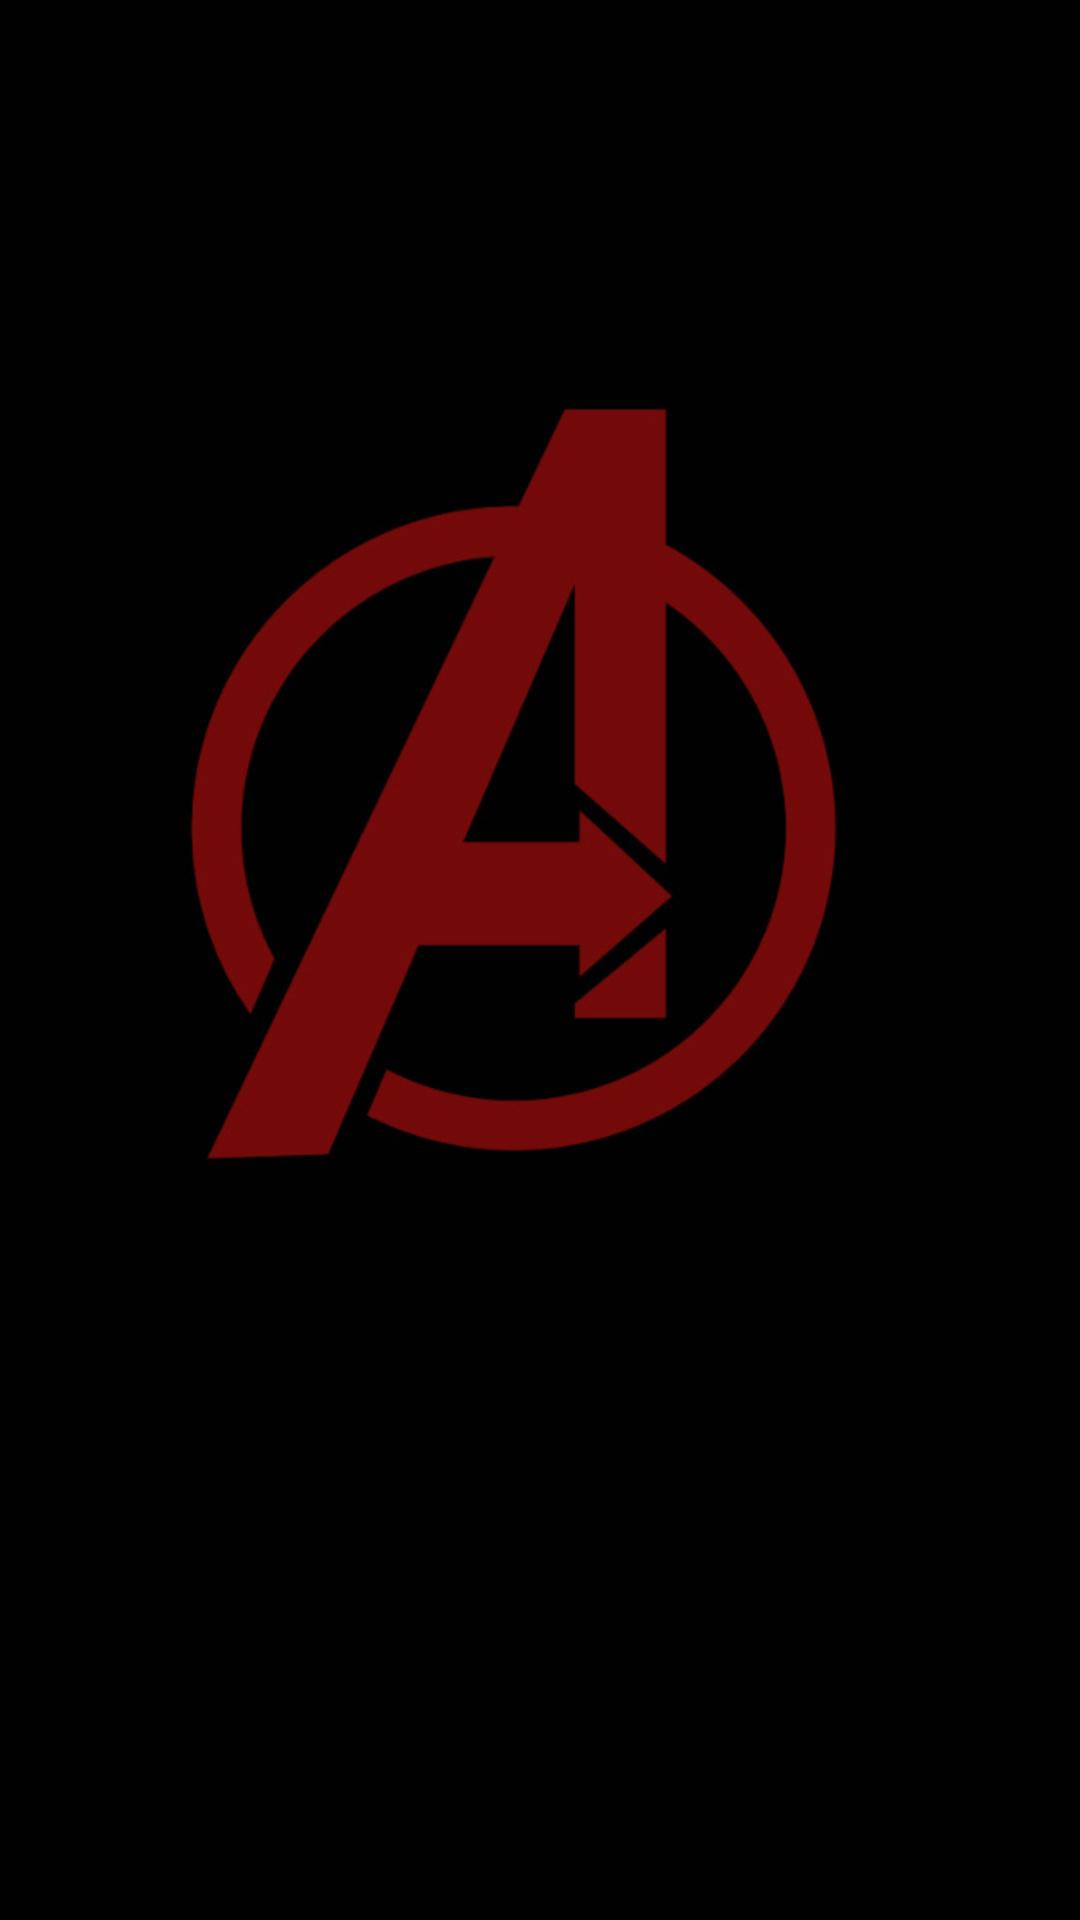 1080x1920 avengers minimal logo iphone 7 6s 6 plus pixel - Avengers a logo 4k ...